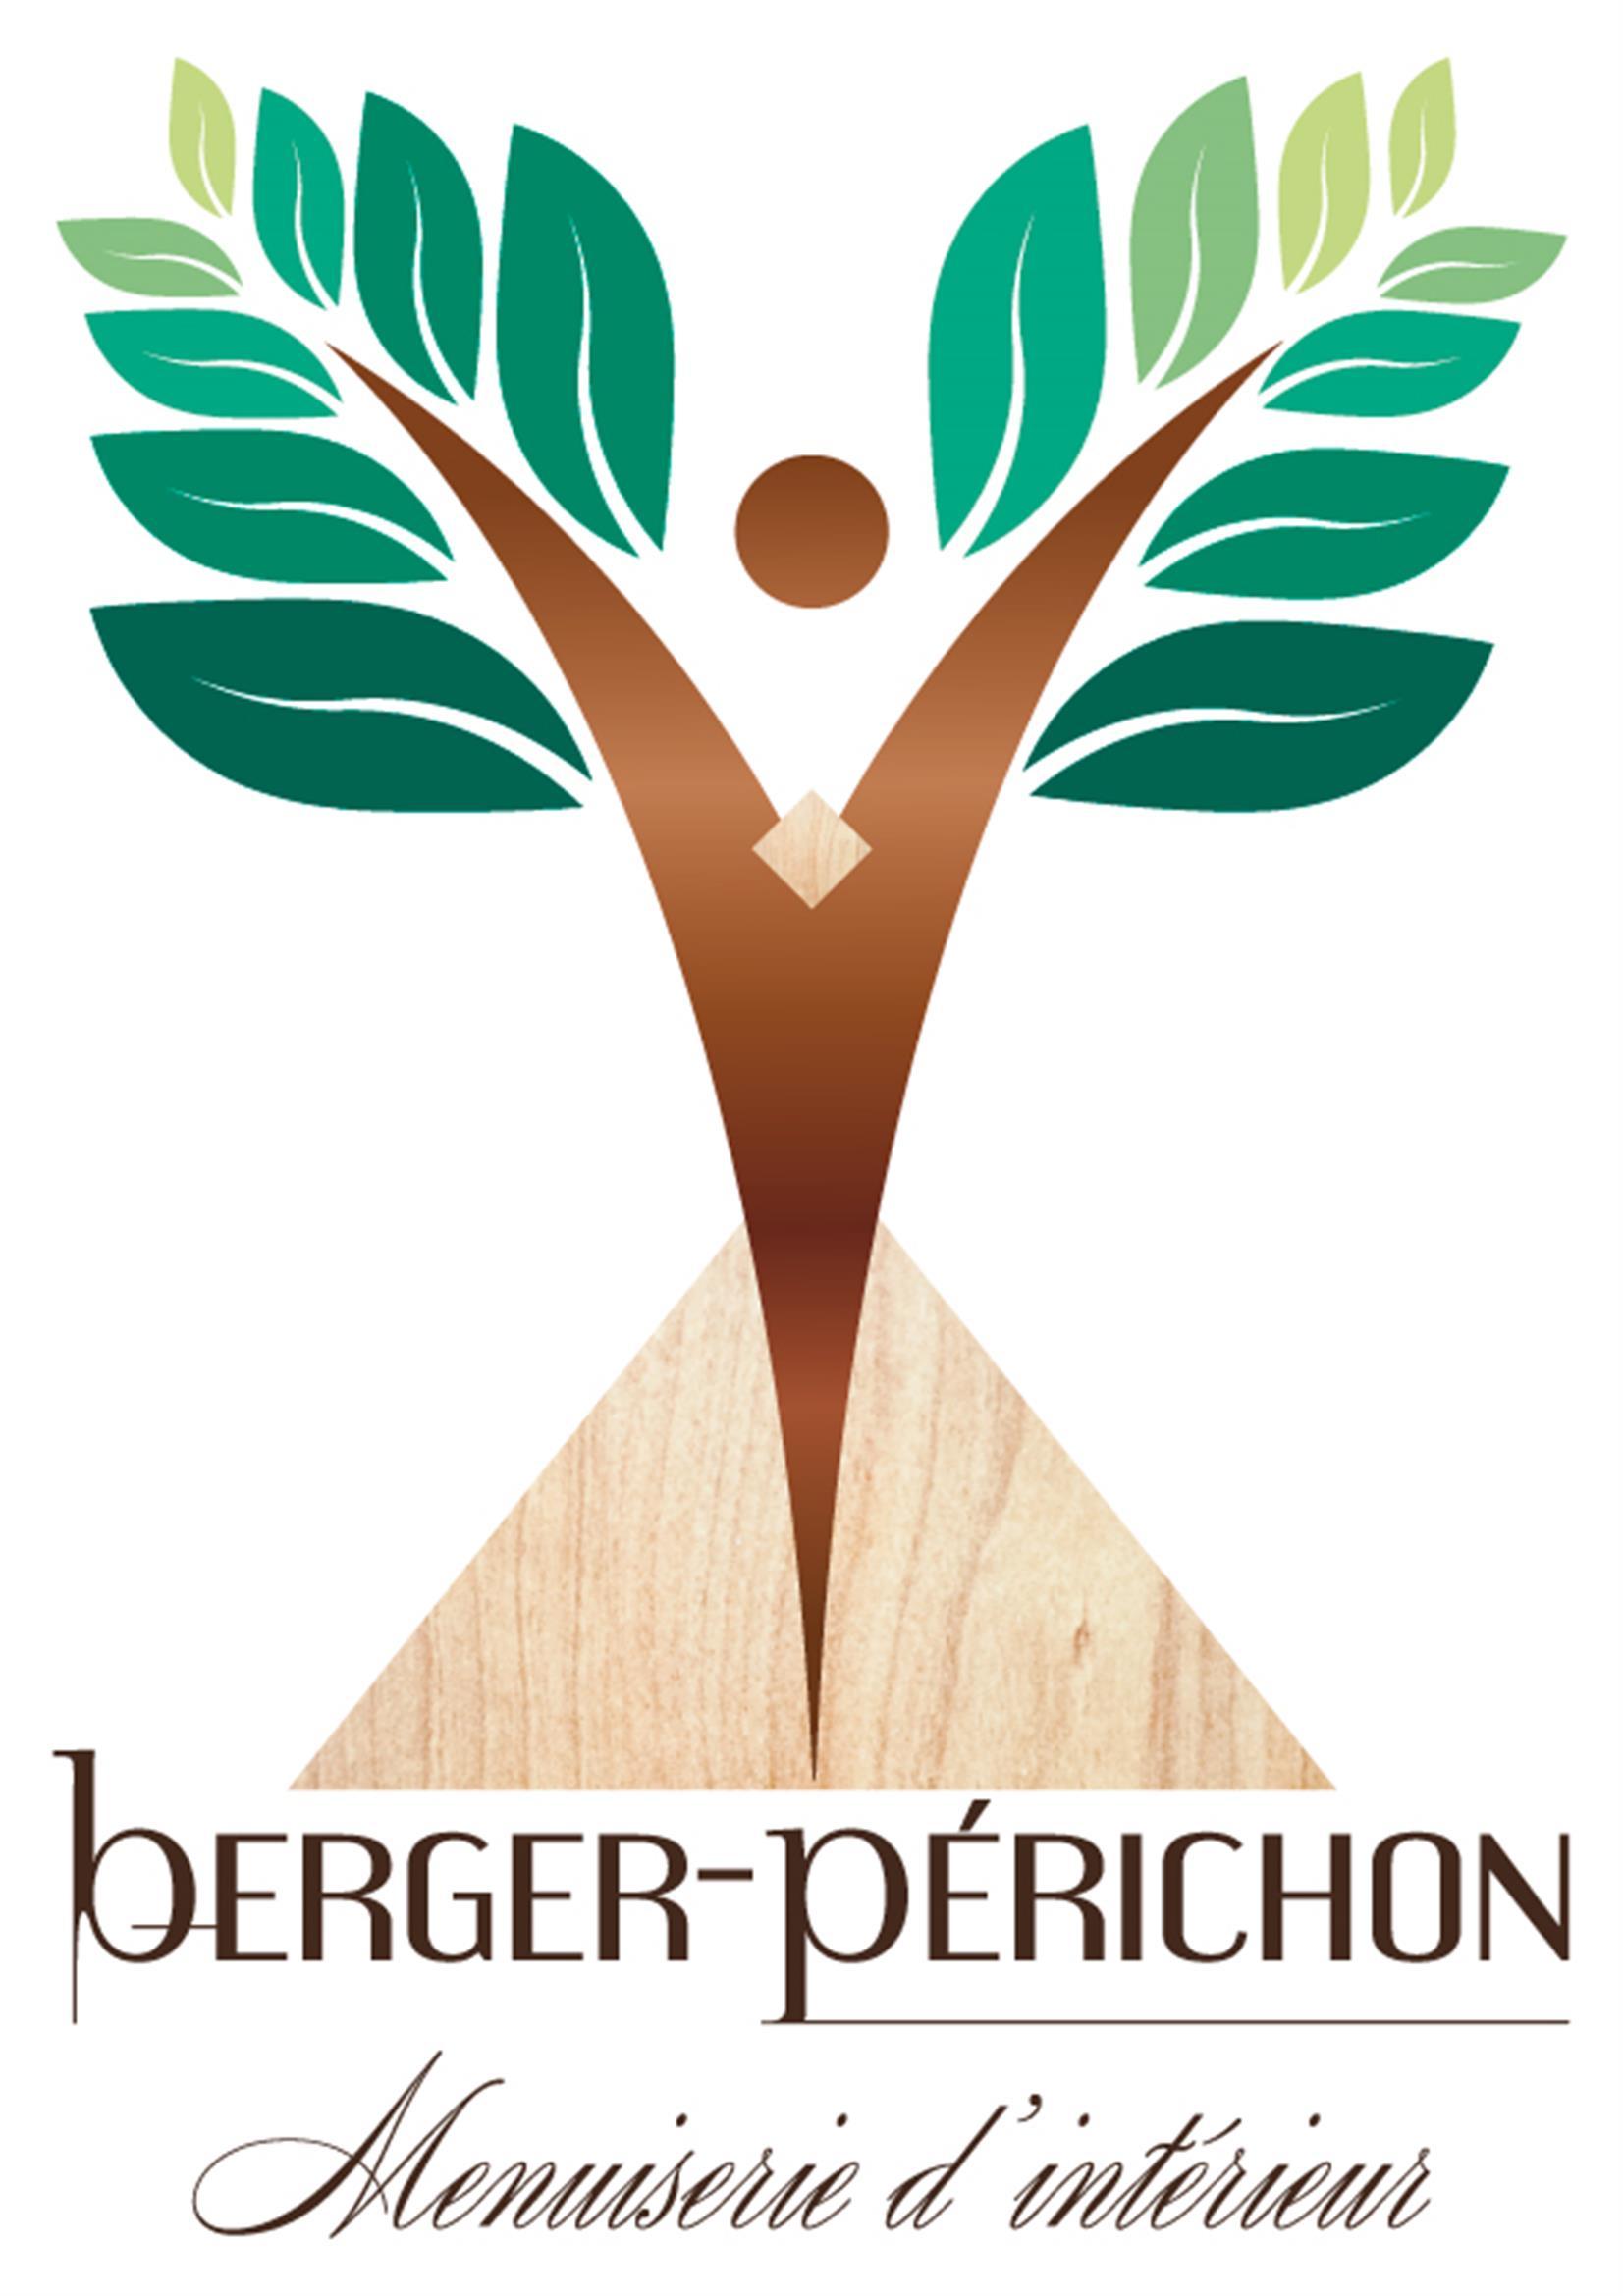 Berger-Perichon